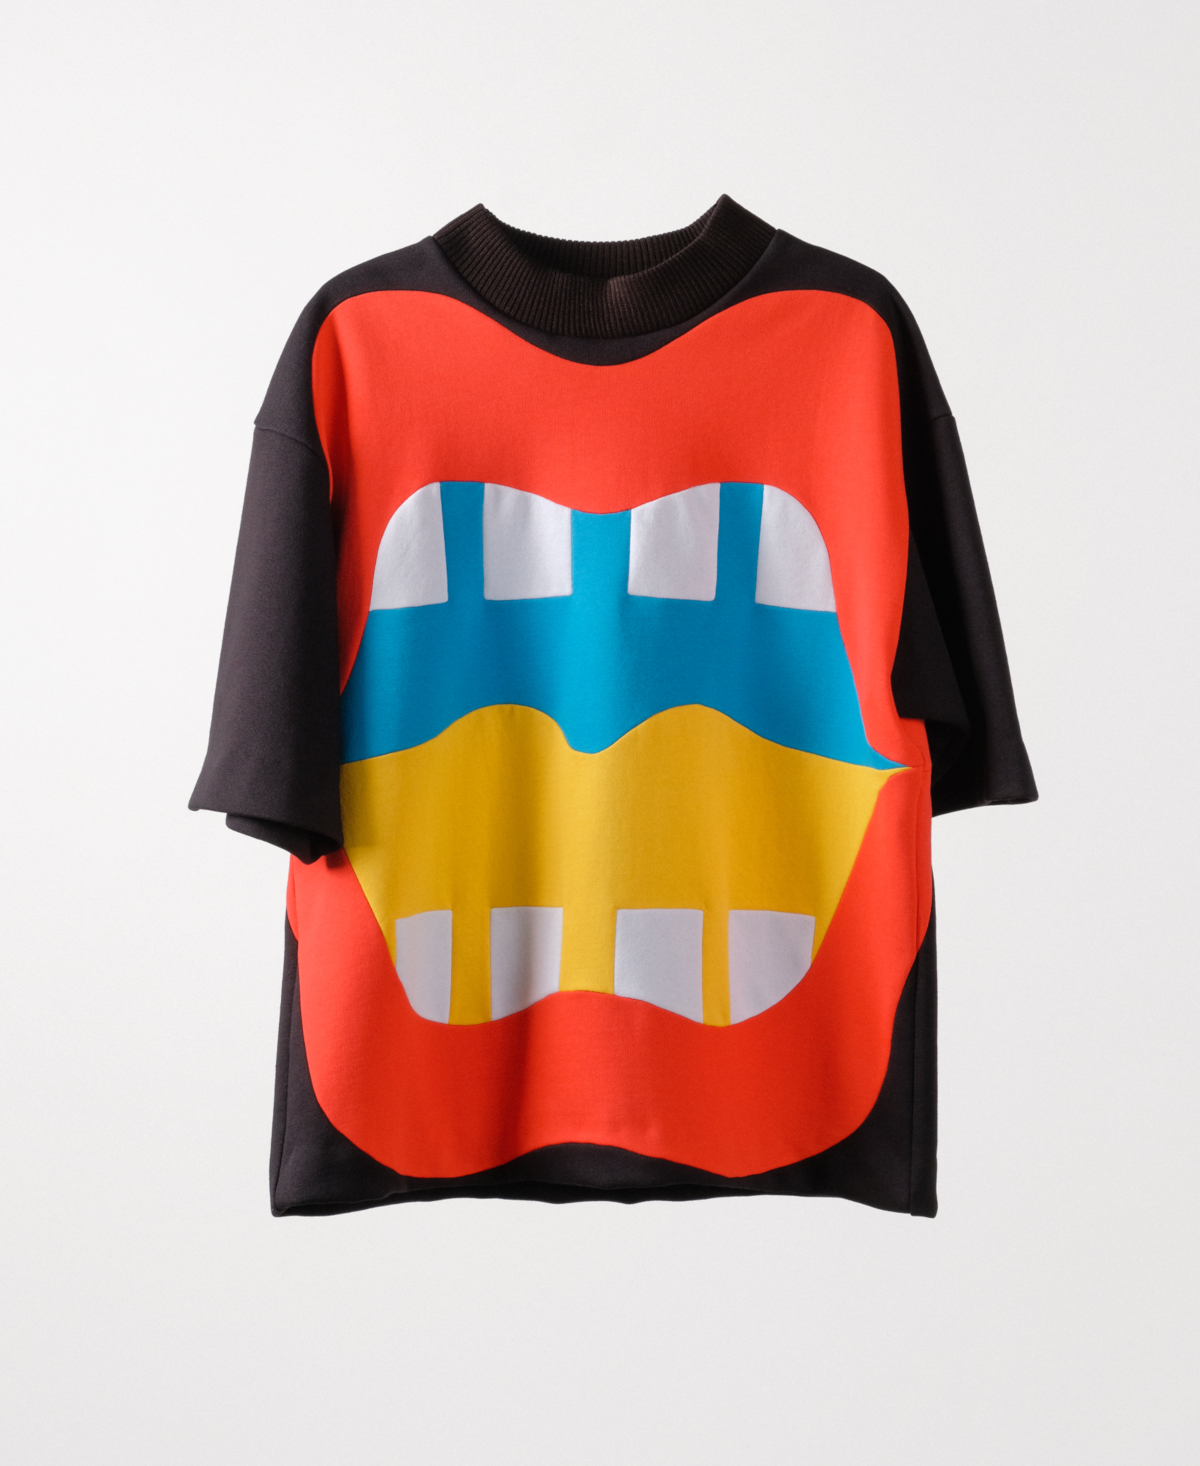 Screaming Black T-shirt